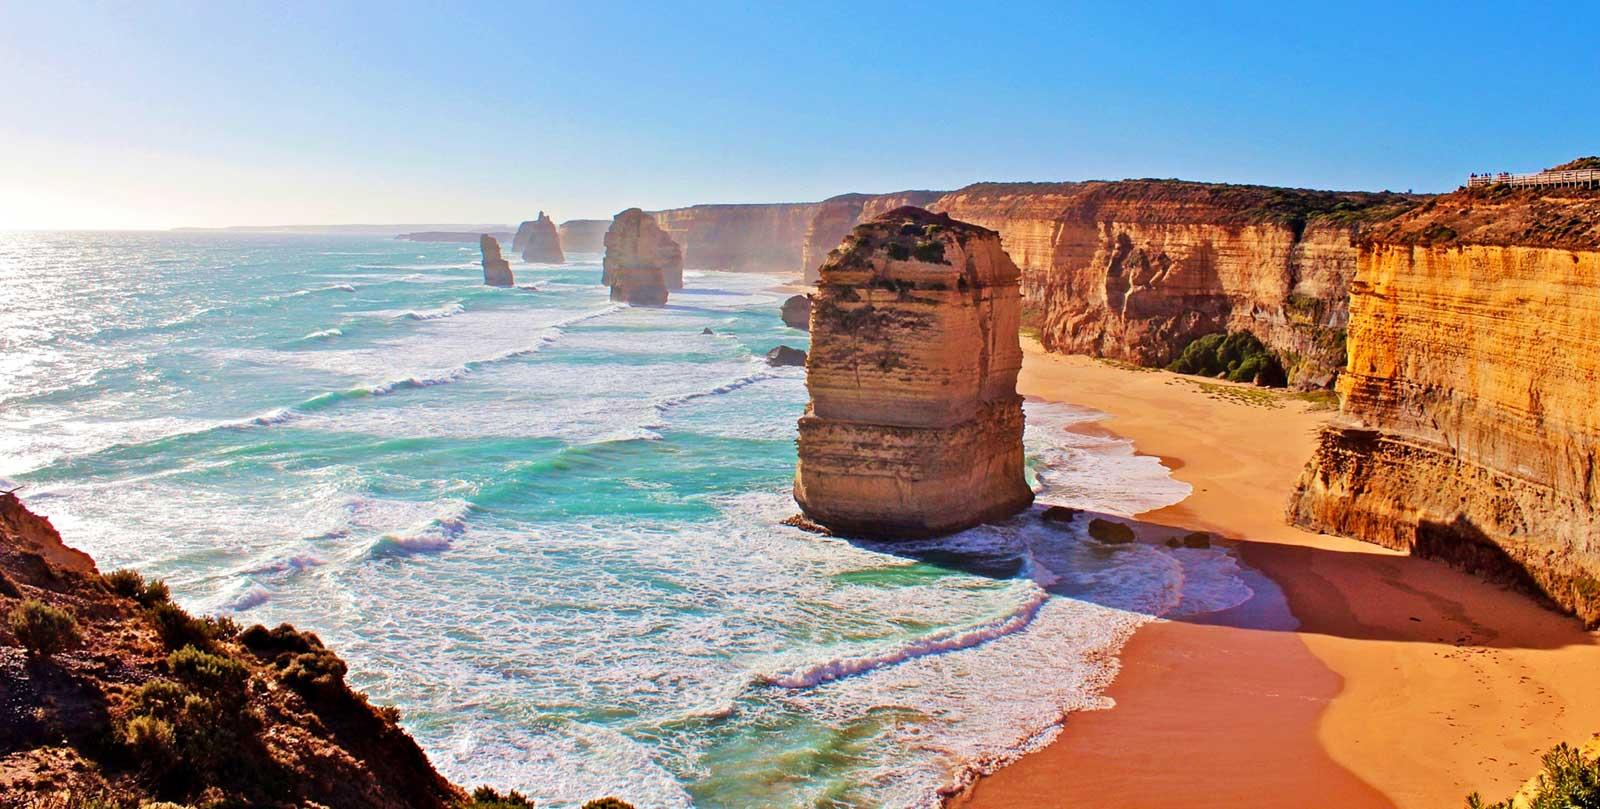 australia dodici apostoli